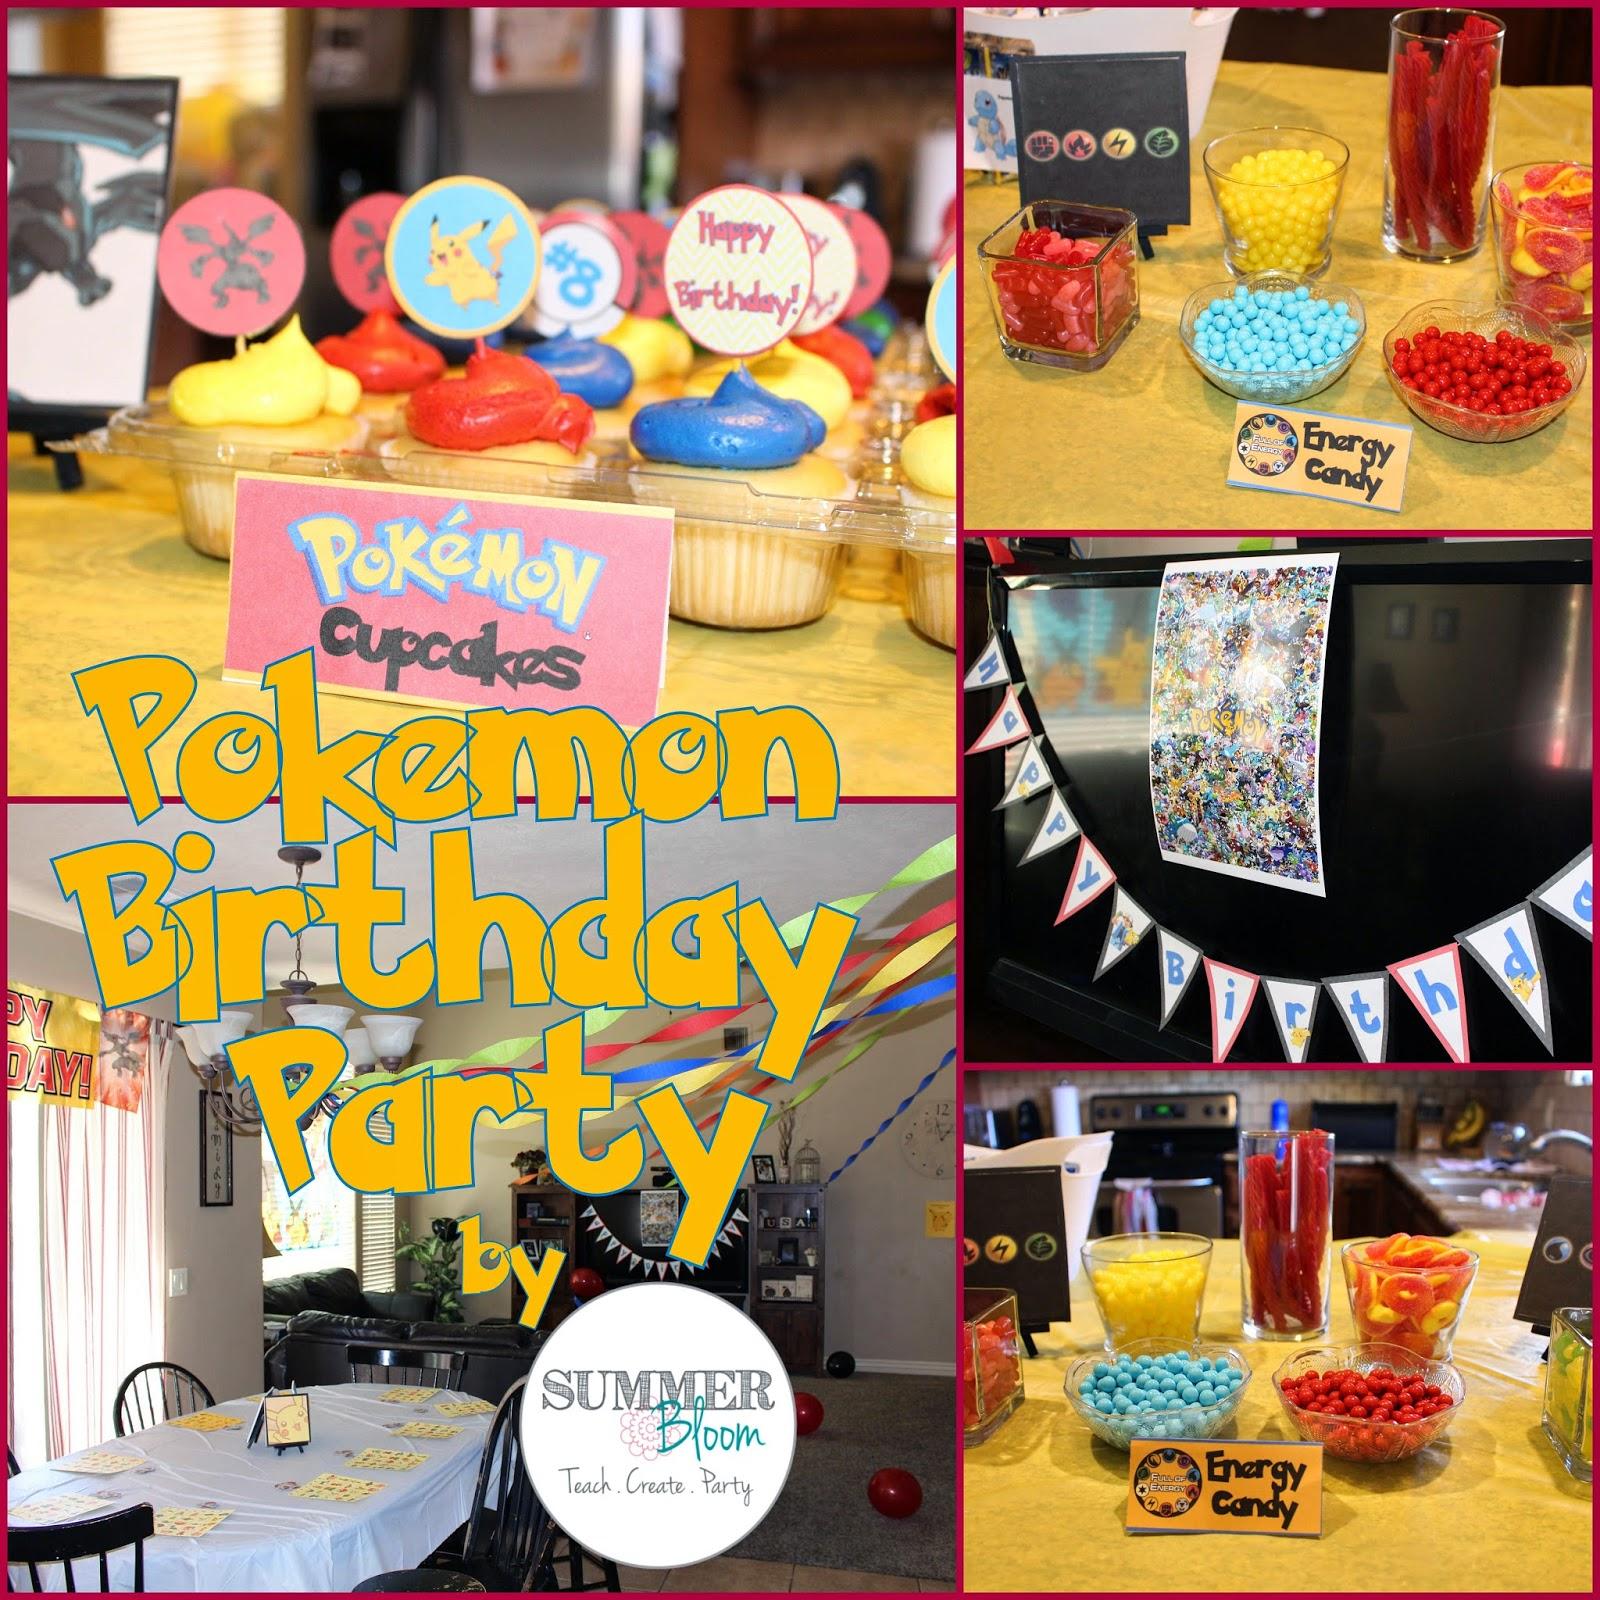 Summer Bloom Teach Create Party Pokemon Birthday Party